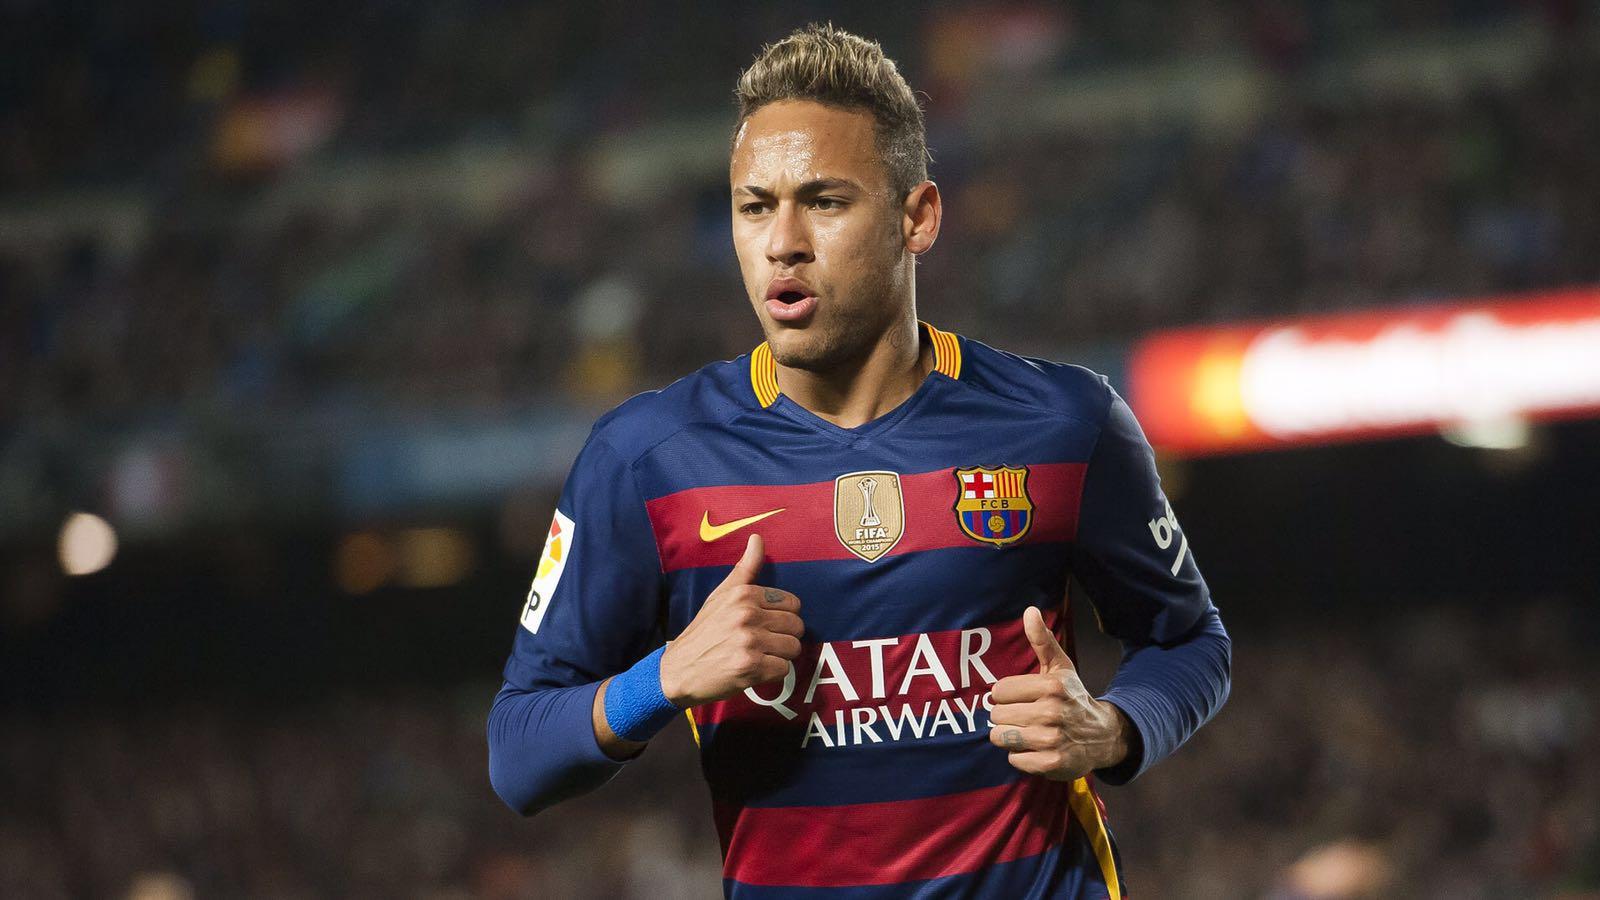 ab65a7c13f960 Neymar Jr.